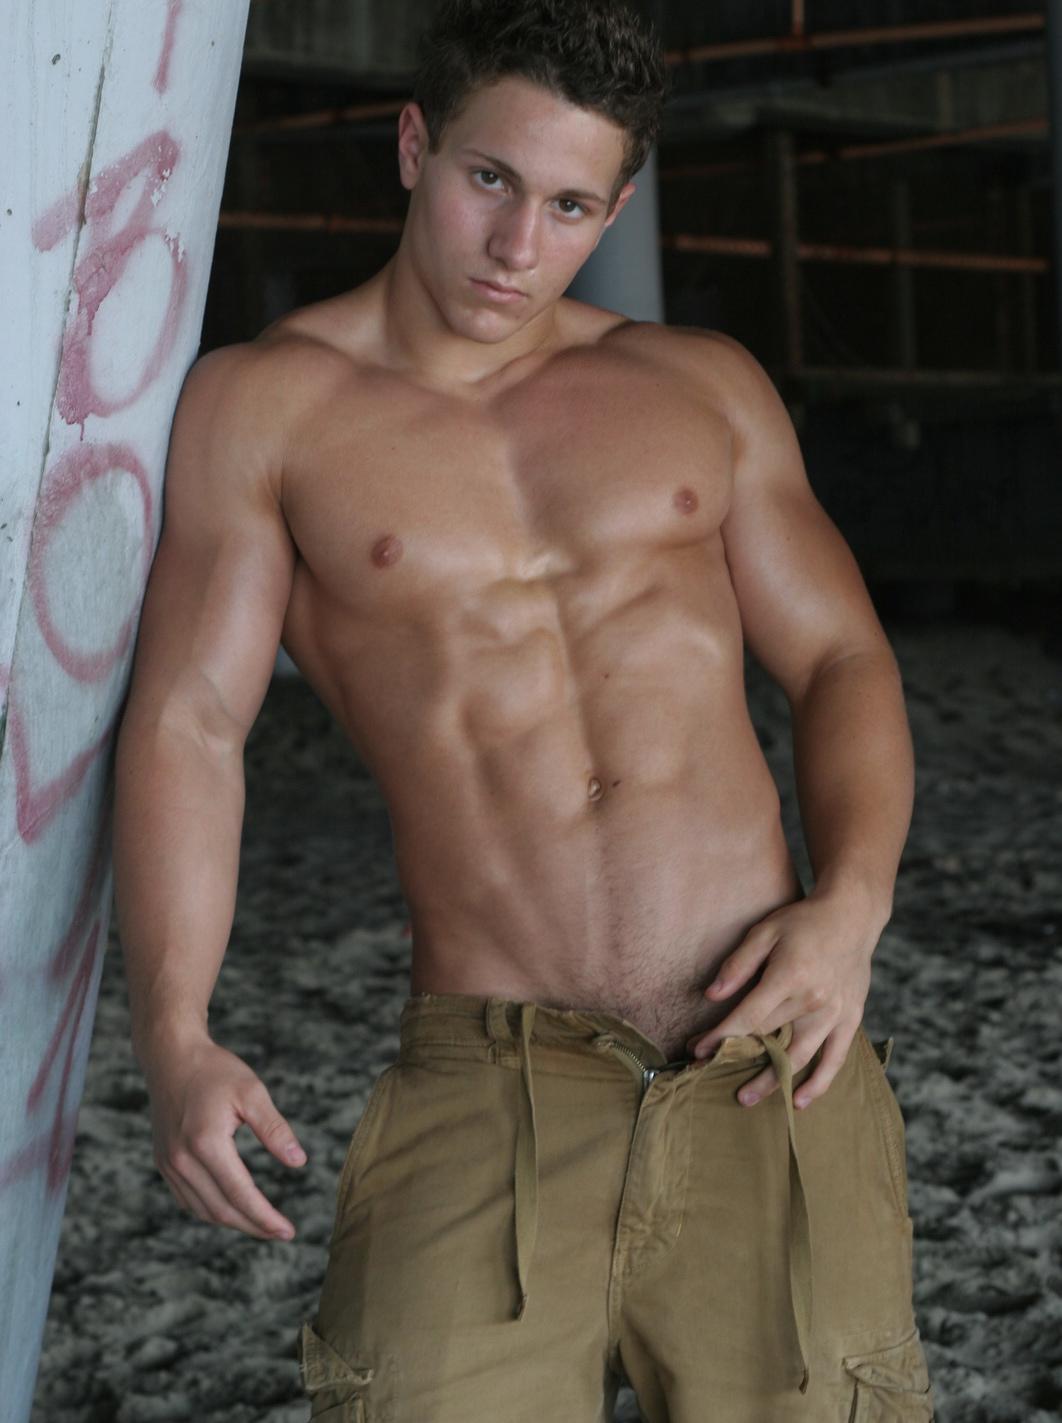 Boy sucking big hard cock